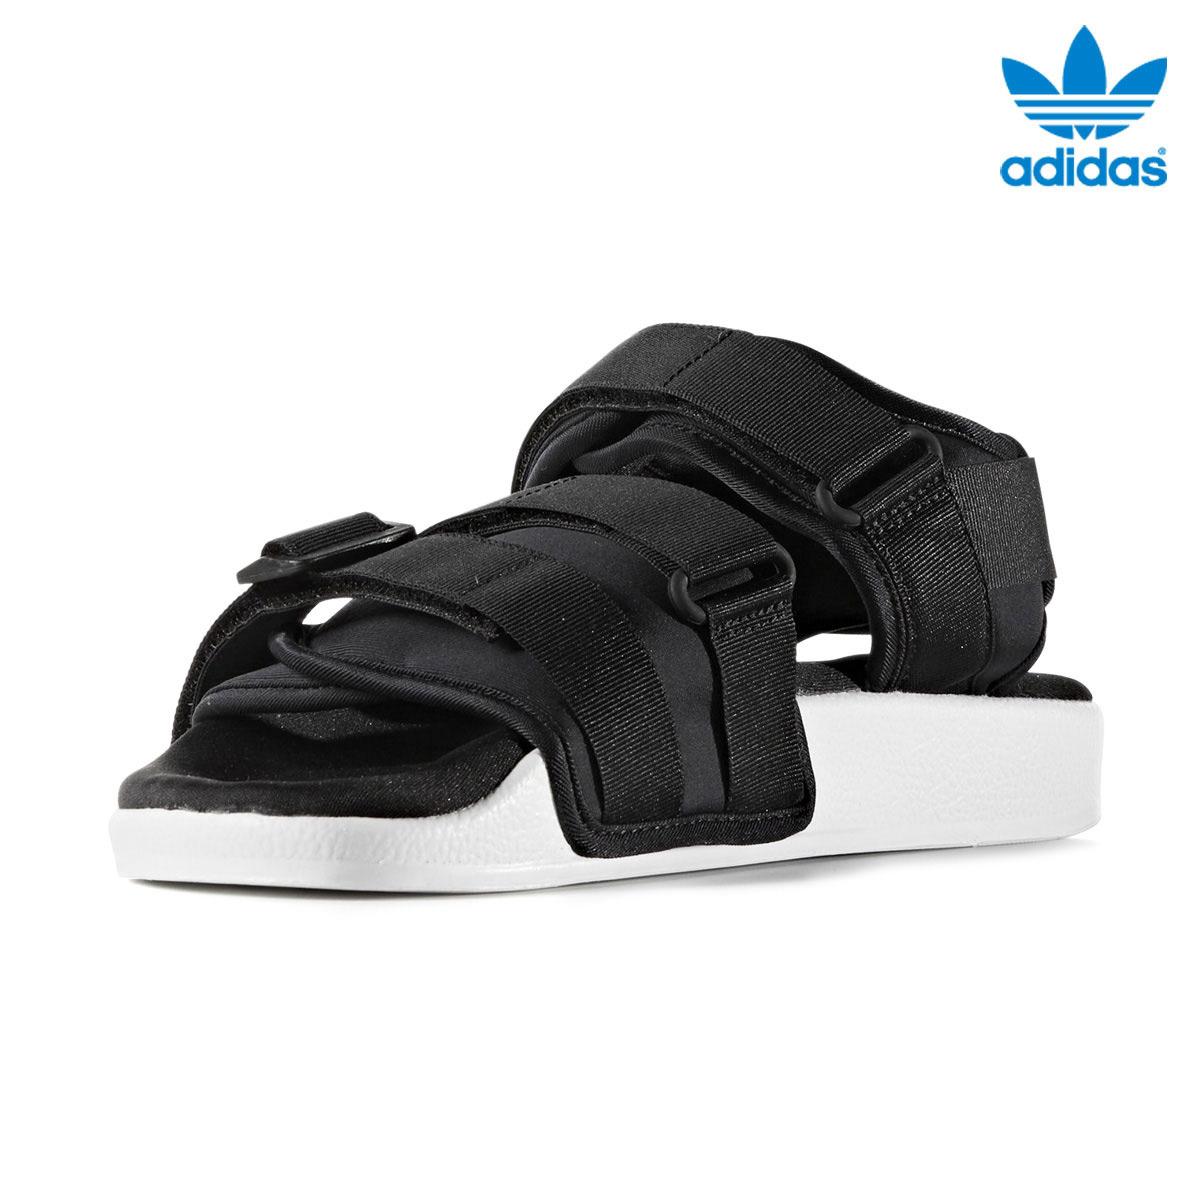 Wアディダスオリジナルスアディレッタサンダル Wcore White17ss Sandal Blackcore Blackrunning Adidas Orginals I Adilette 5AR4jq3L